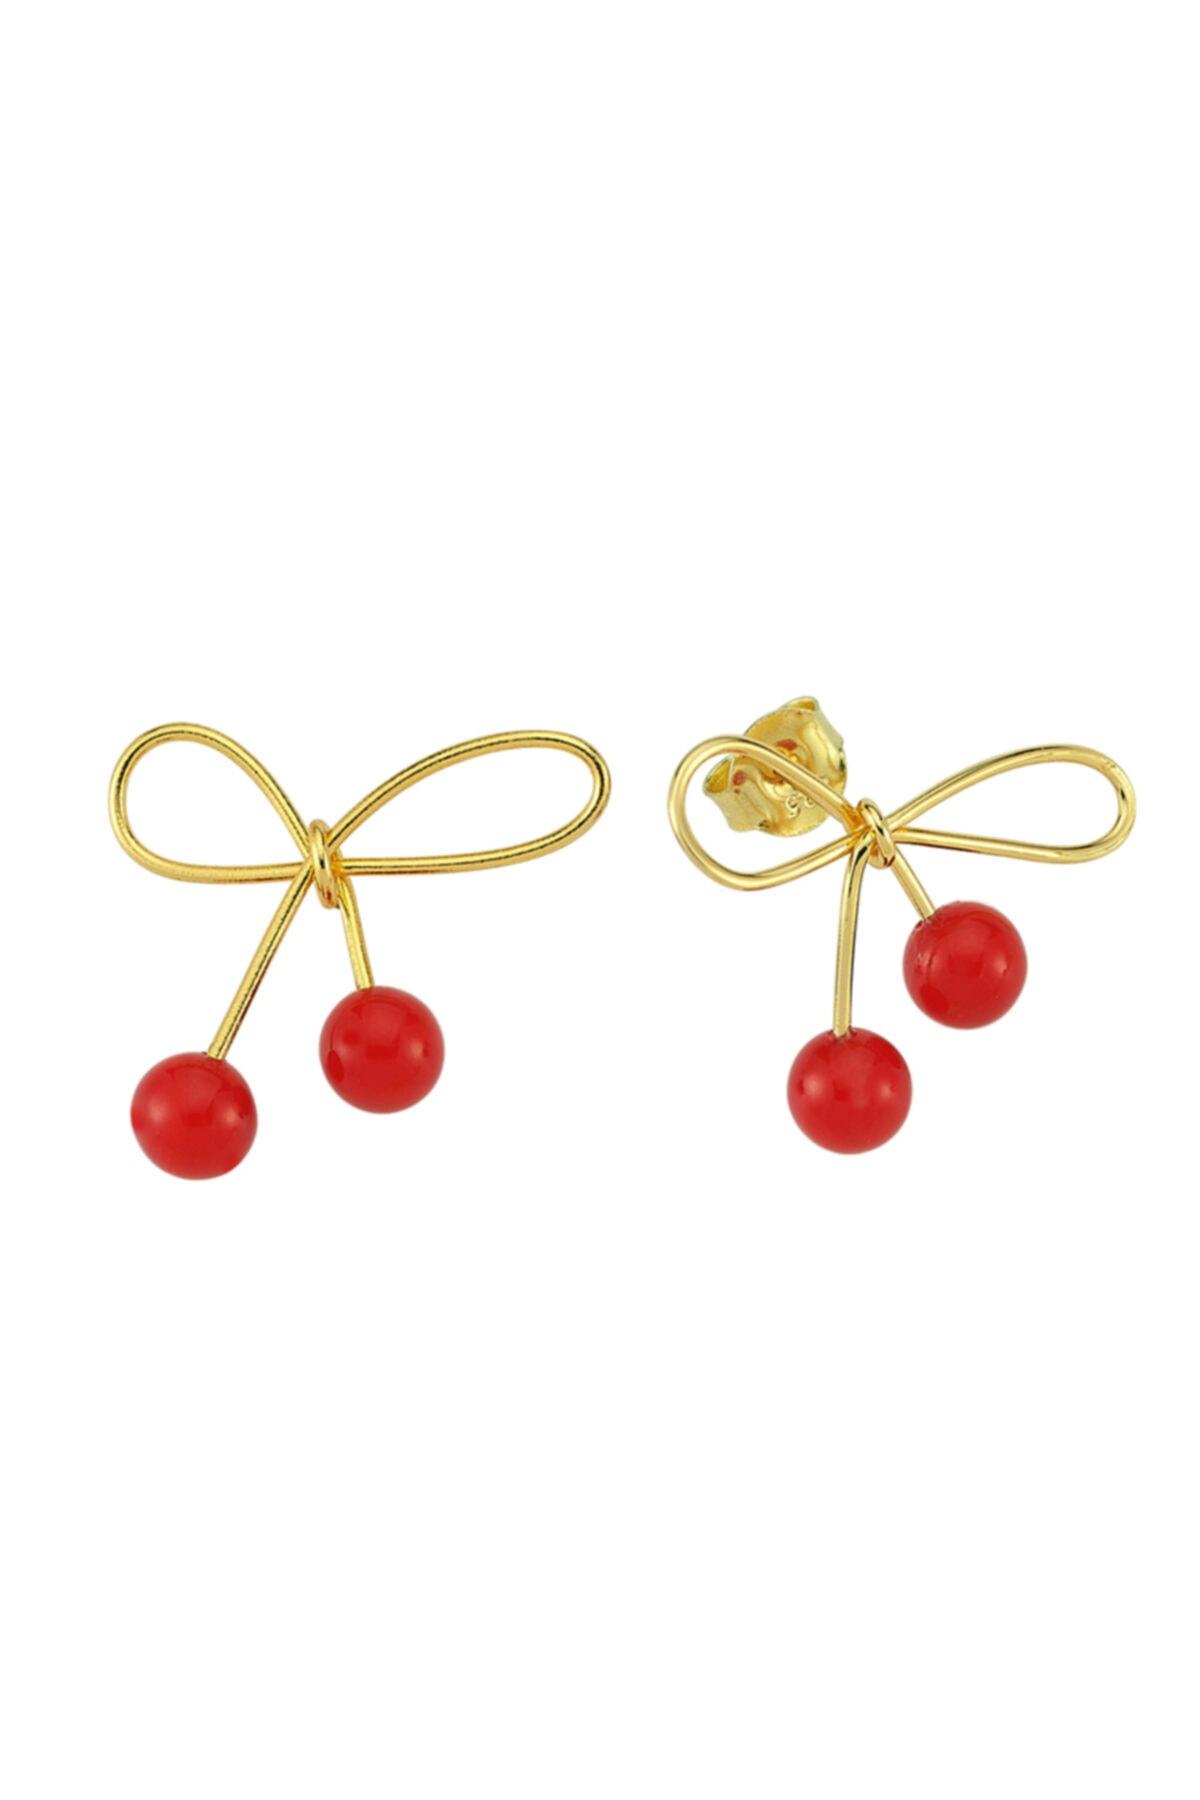 Luzdemia Red Cherry Earr. 925 1